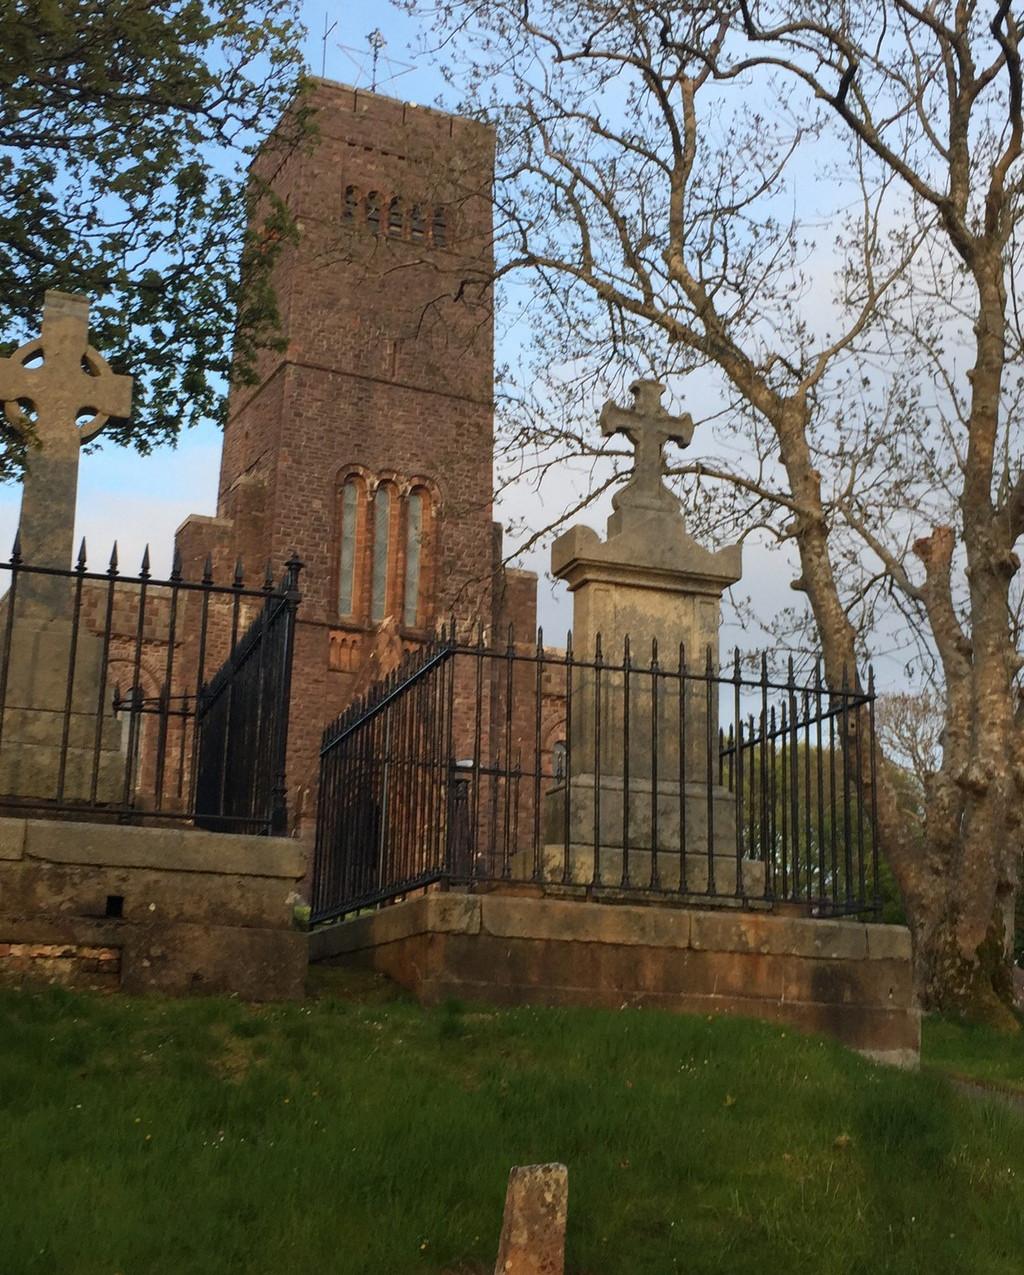 Newport Church 100 years on